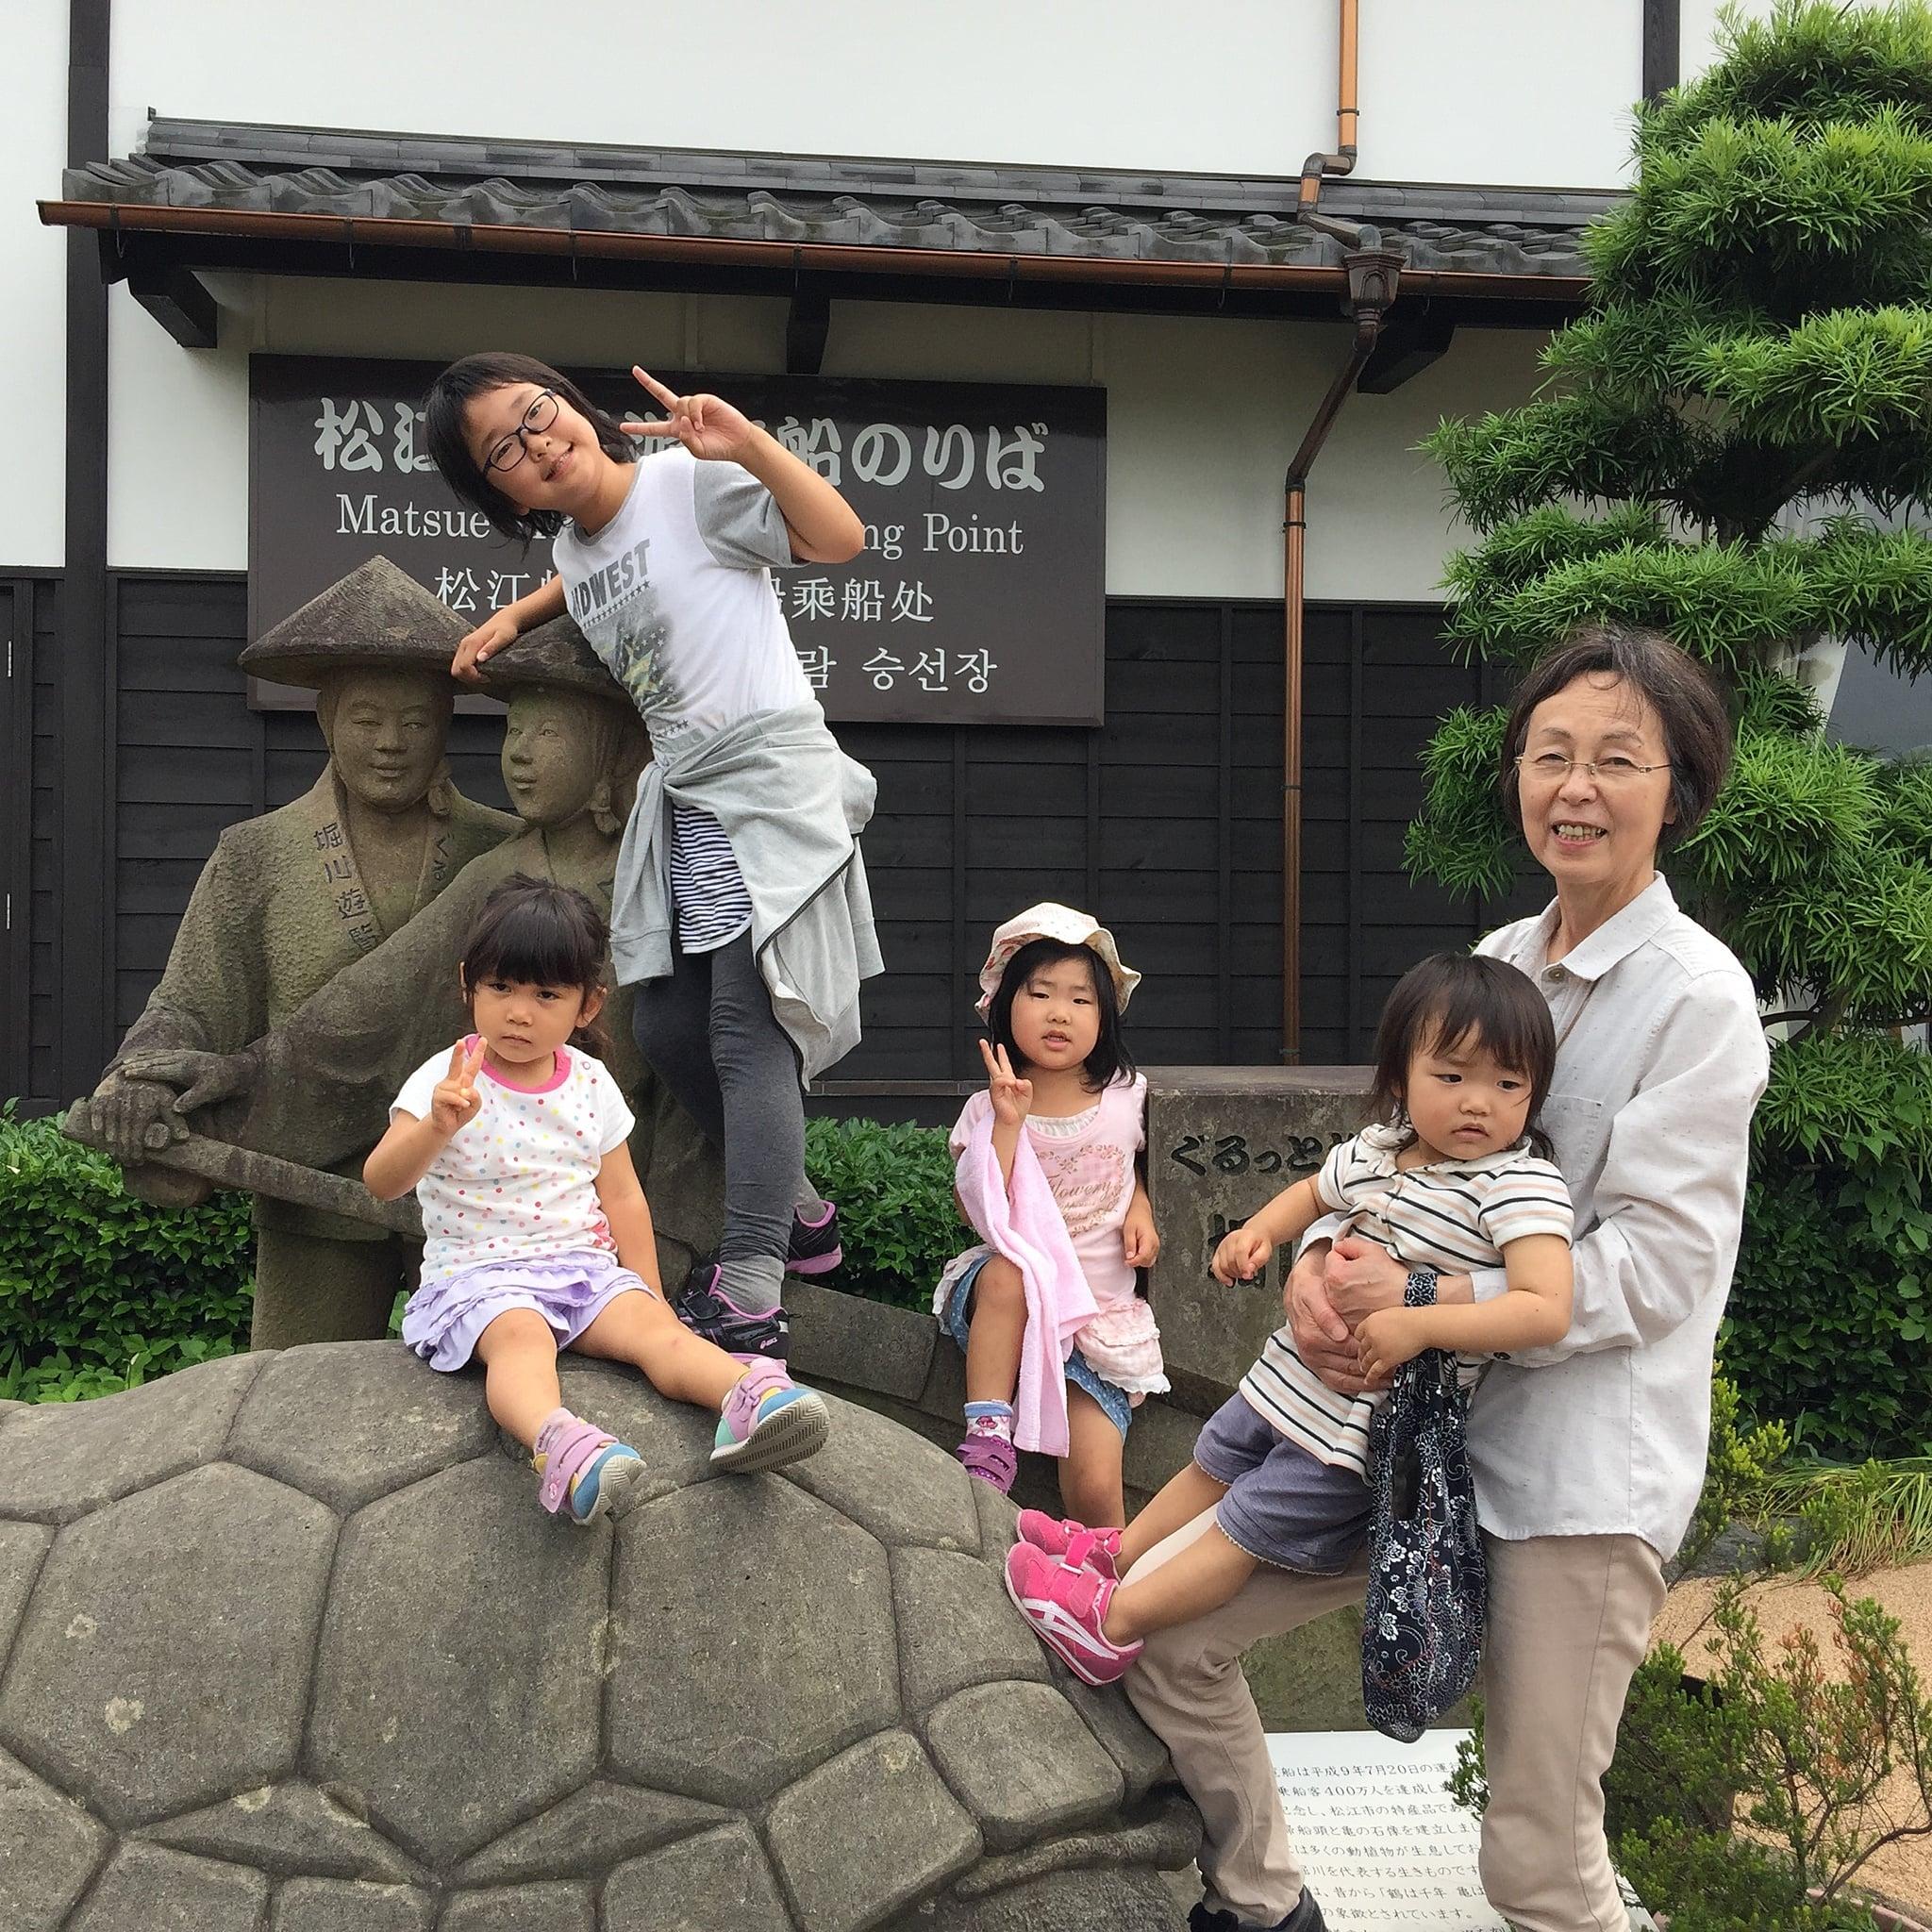 http://ogura-sekkei.jp/files/libs/48/201606151136446858.JPG